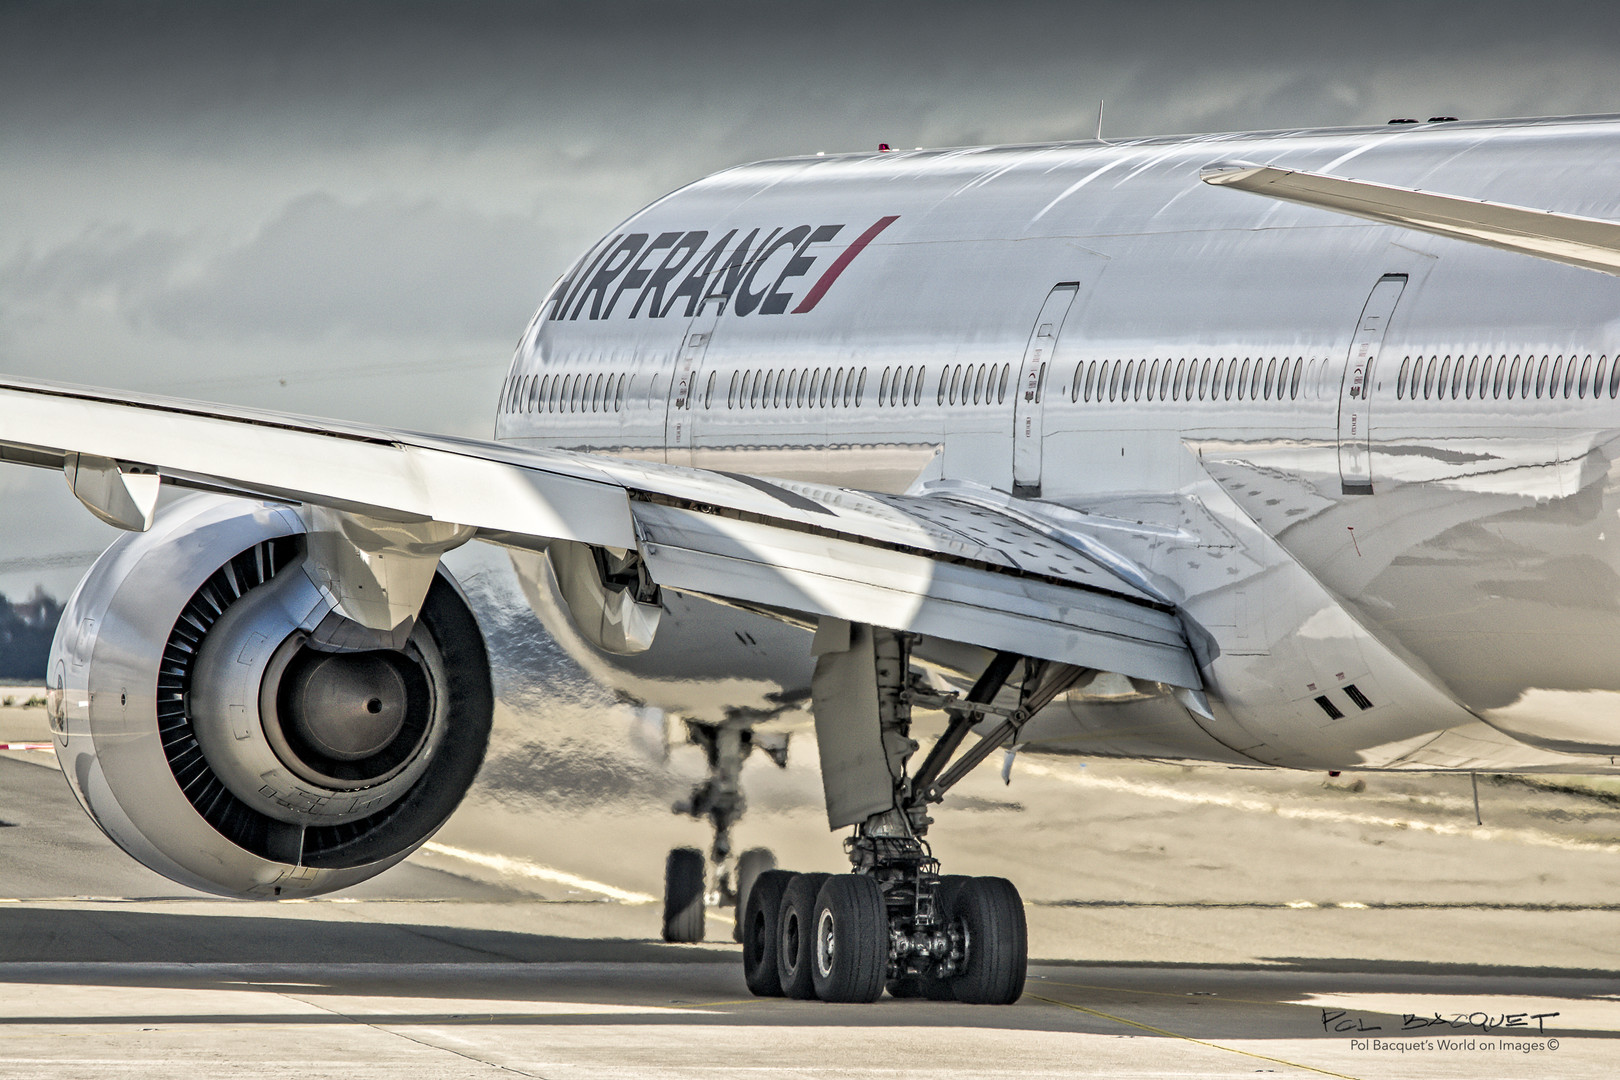 Boeing 777, POL BACQUET